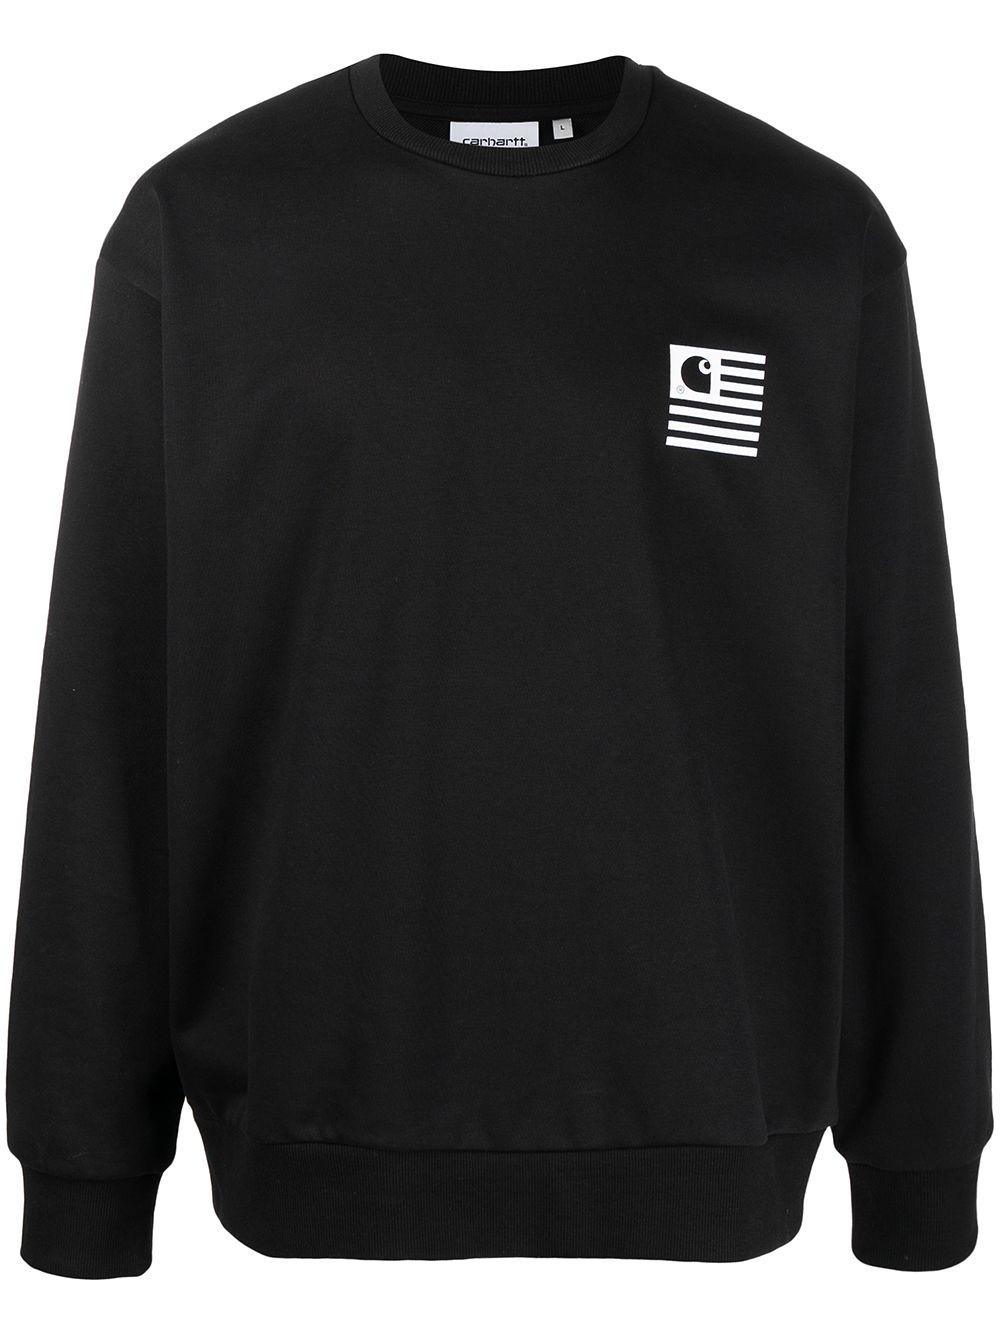 STATE CHROMO SWEATSHIRT CARHARTT | Sweatshirts | I02898489.90